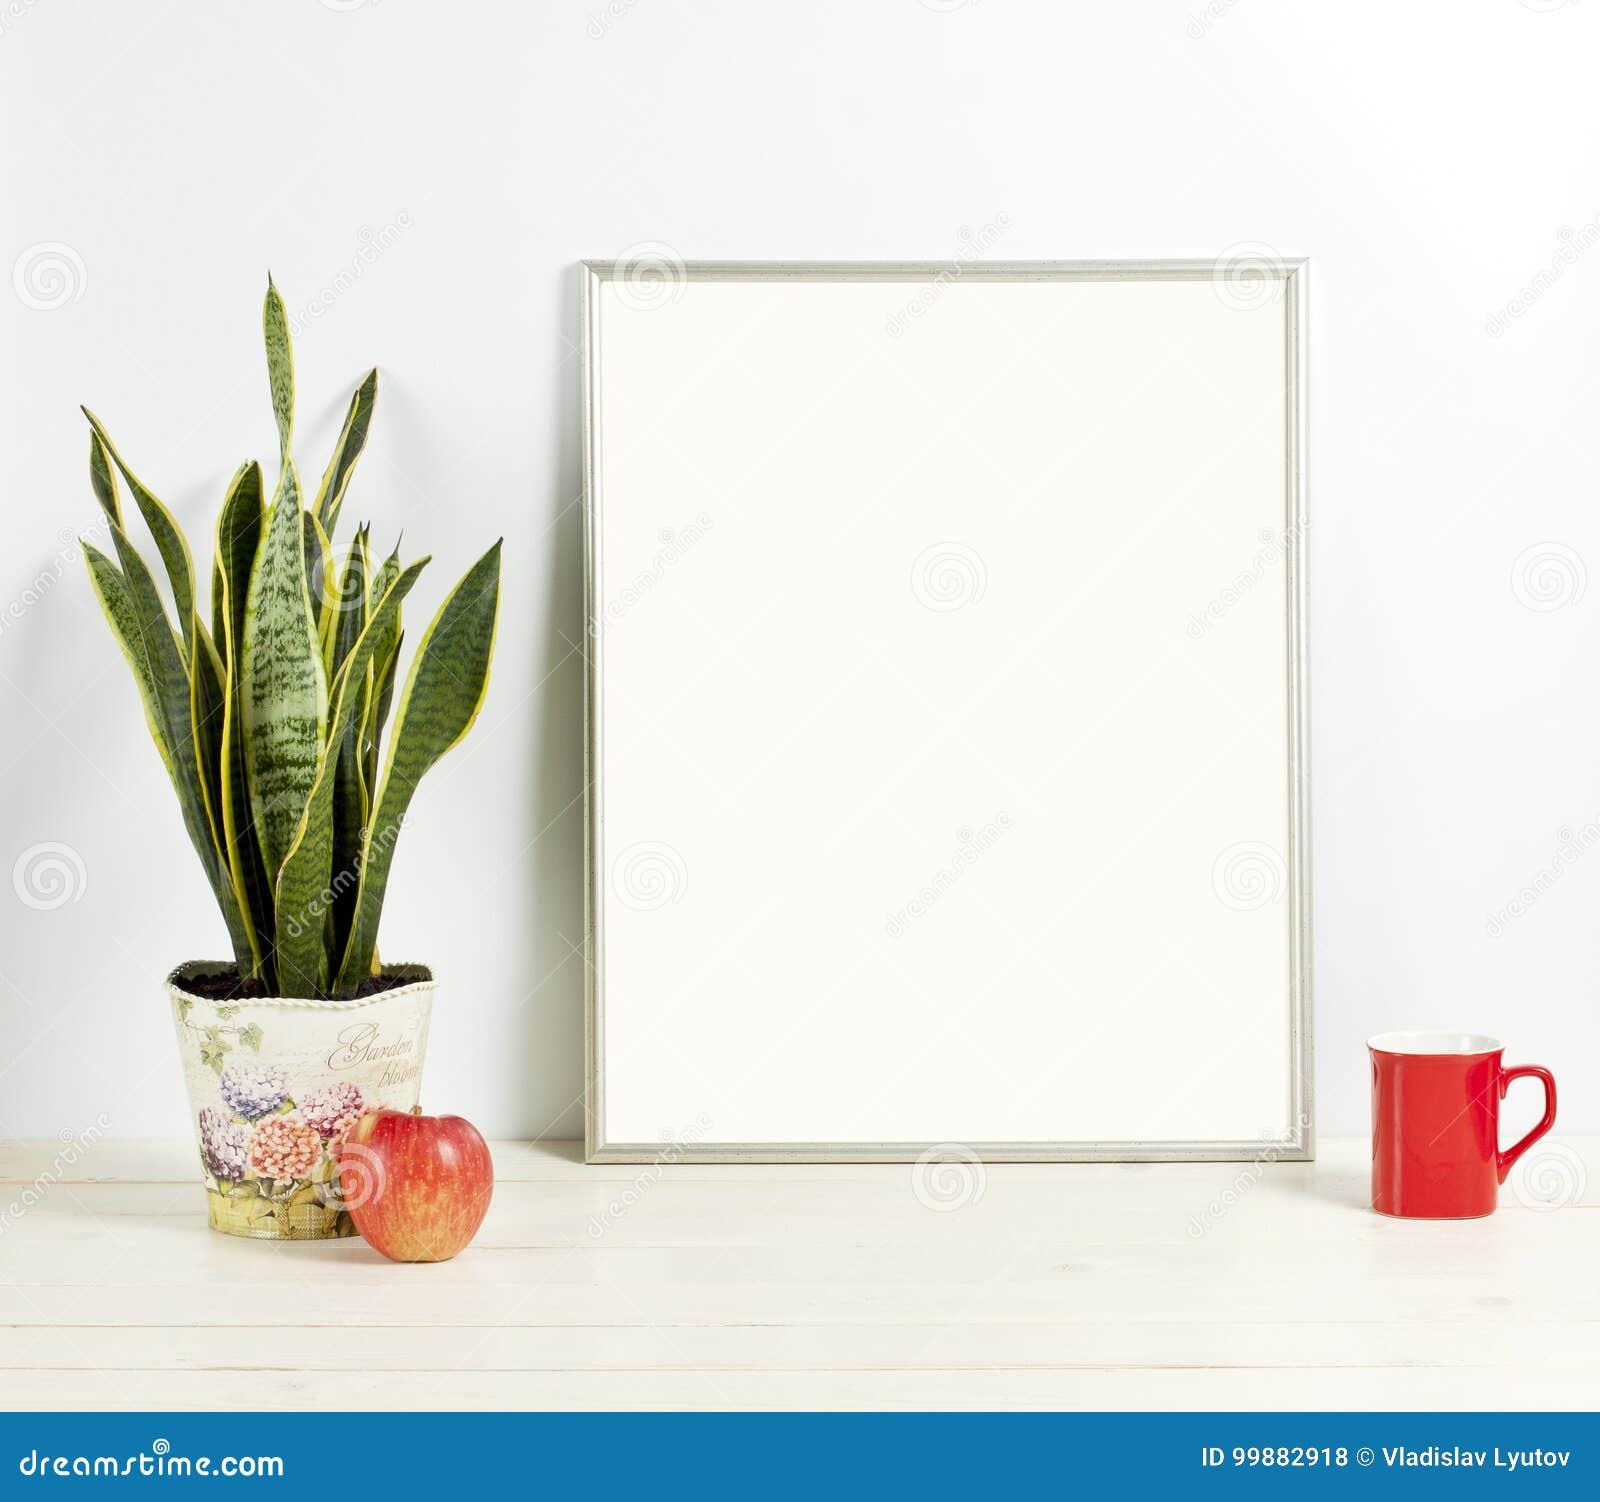 Silver Frame Mockup With Plant Pot Mug And Apple On Wooden Shel